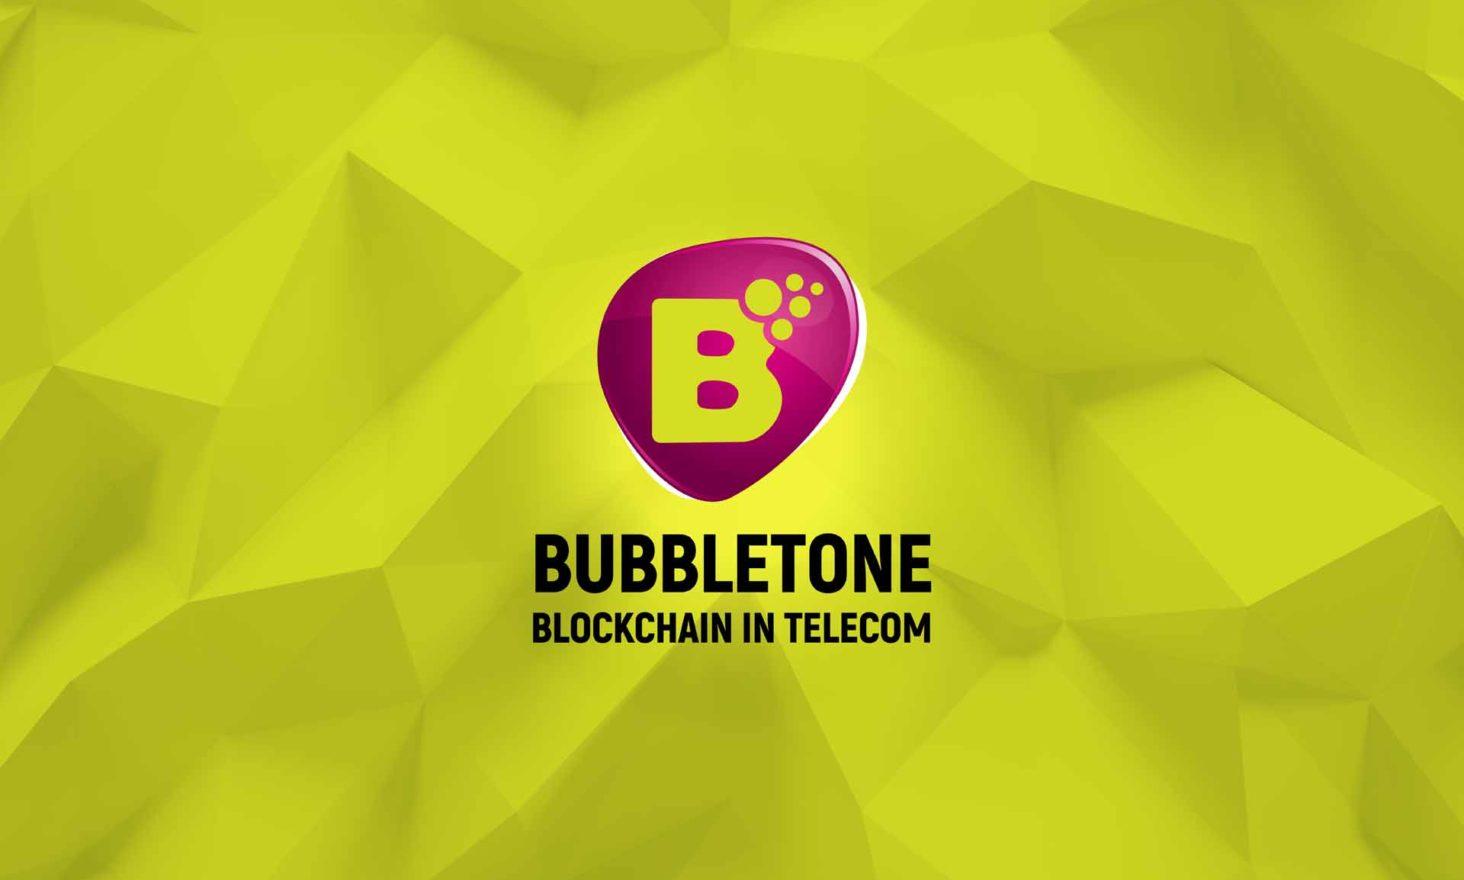 Telecom Startup Bubbletone Offers Tokens with 100% Risk Protection via Dehedge Risk-Hedging Platform